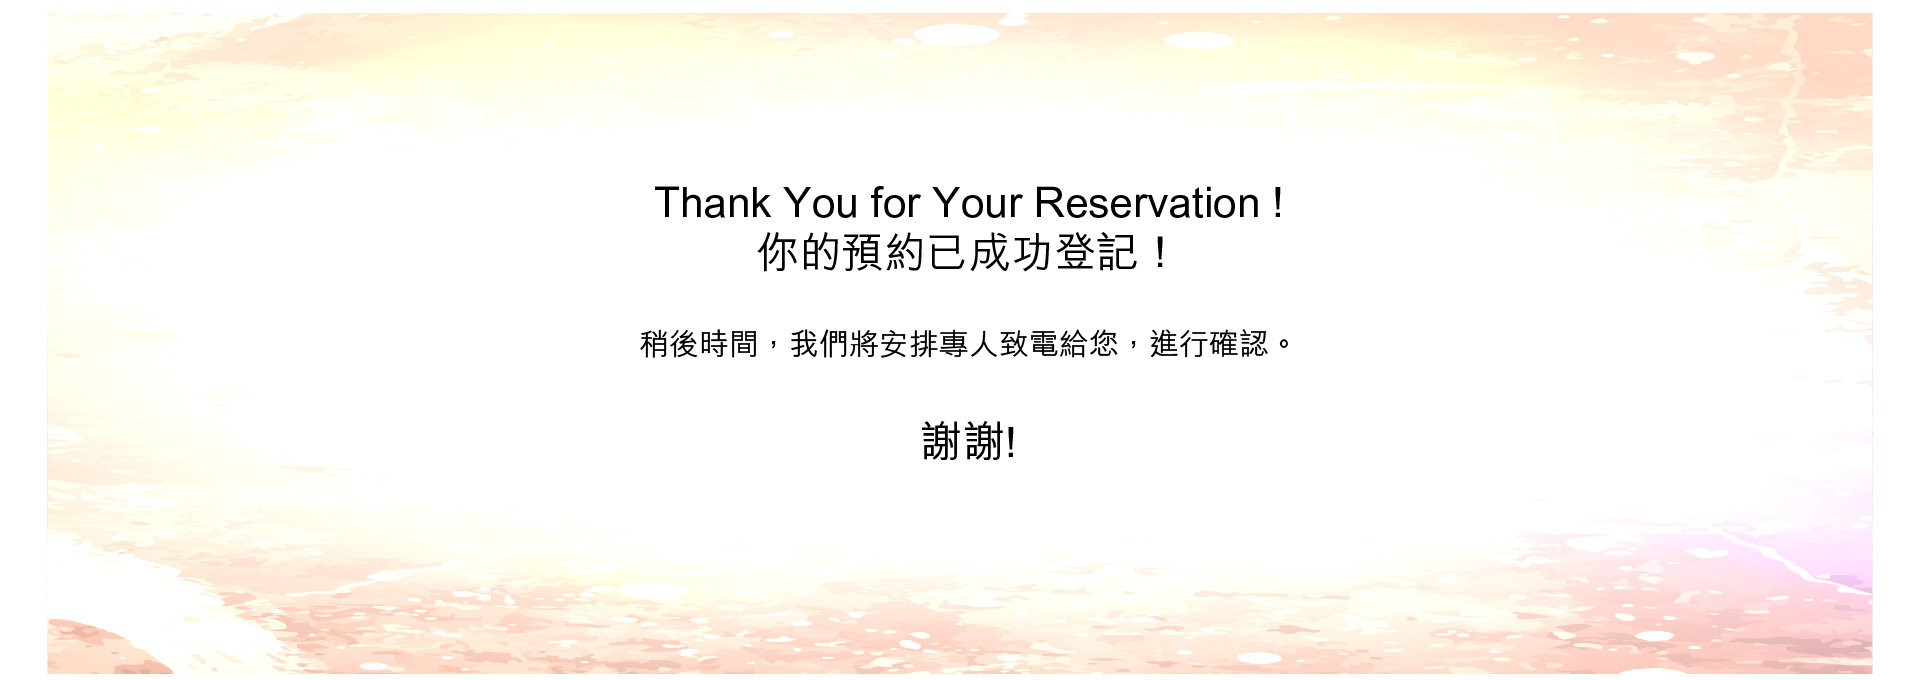 reservation success_工作區域 1.jpg